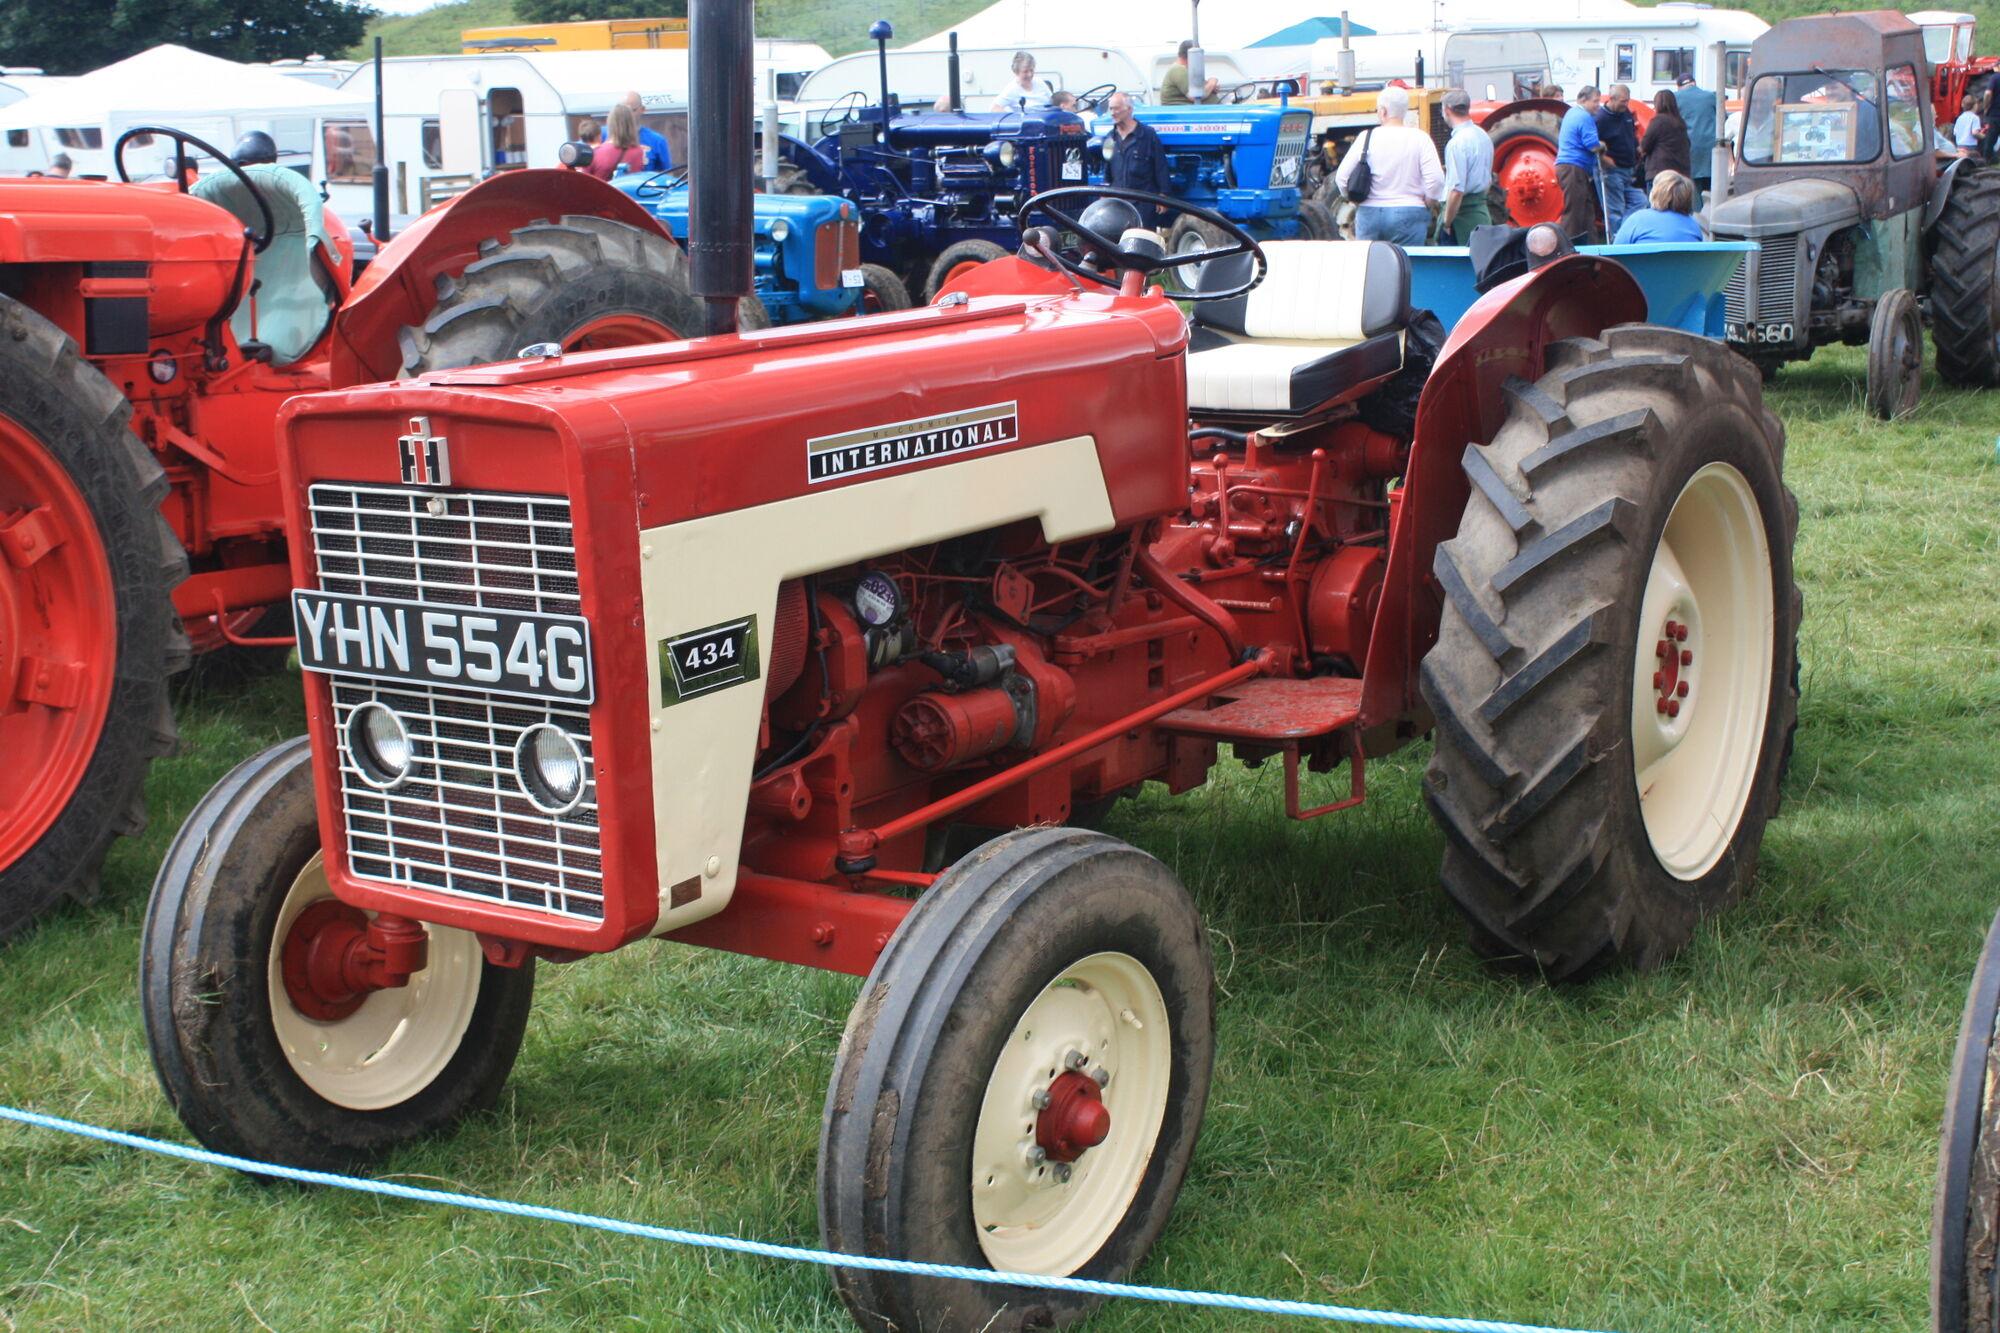 International 434 | Tractor & Construction Plant Wiki | FANDOM powered by  Wikia